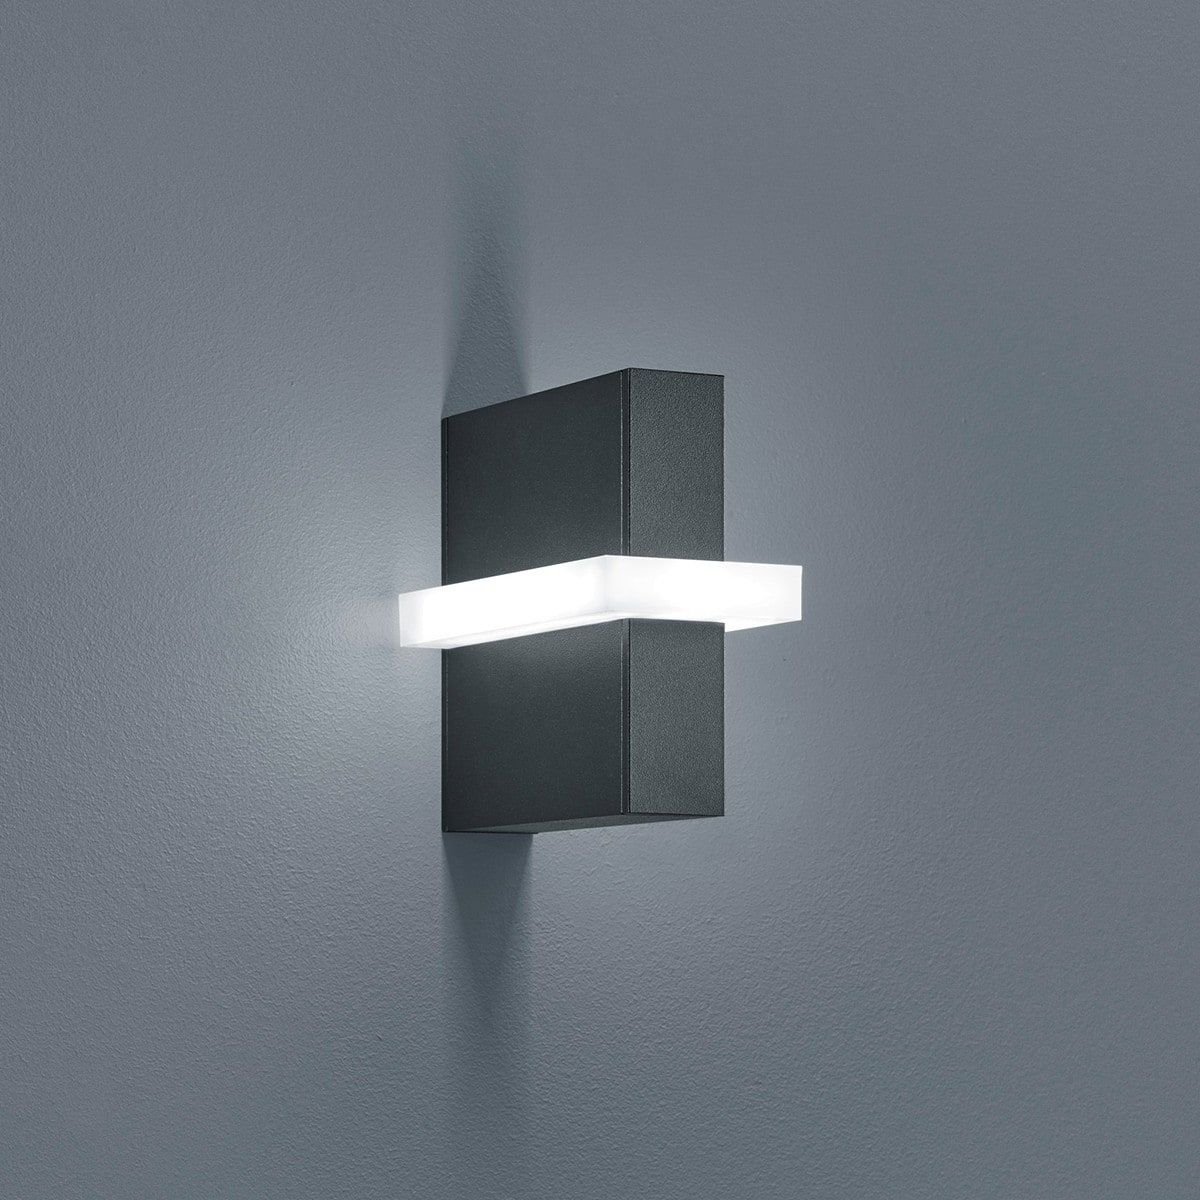 Aussenleuchten Wand Weiss Led Aussenlampe Batterie Lampe Fur Draussen Ohne Strom Aussenbeleuchtung Mit Bewegungsmelder Und Aussenwandleuchte Led Wandleuchte